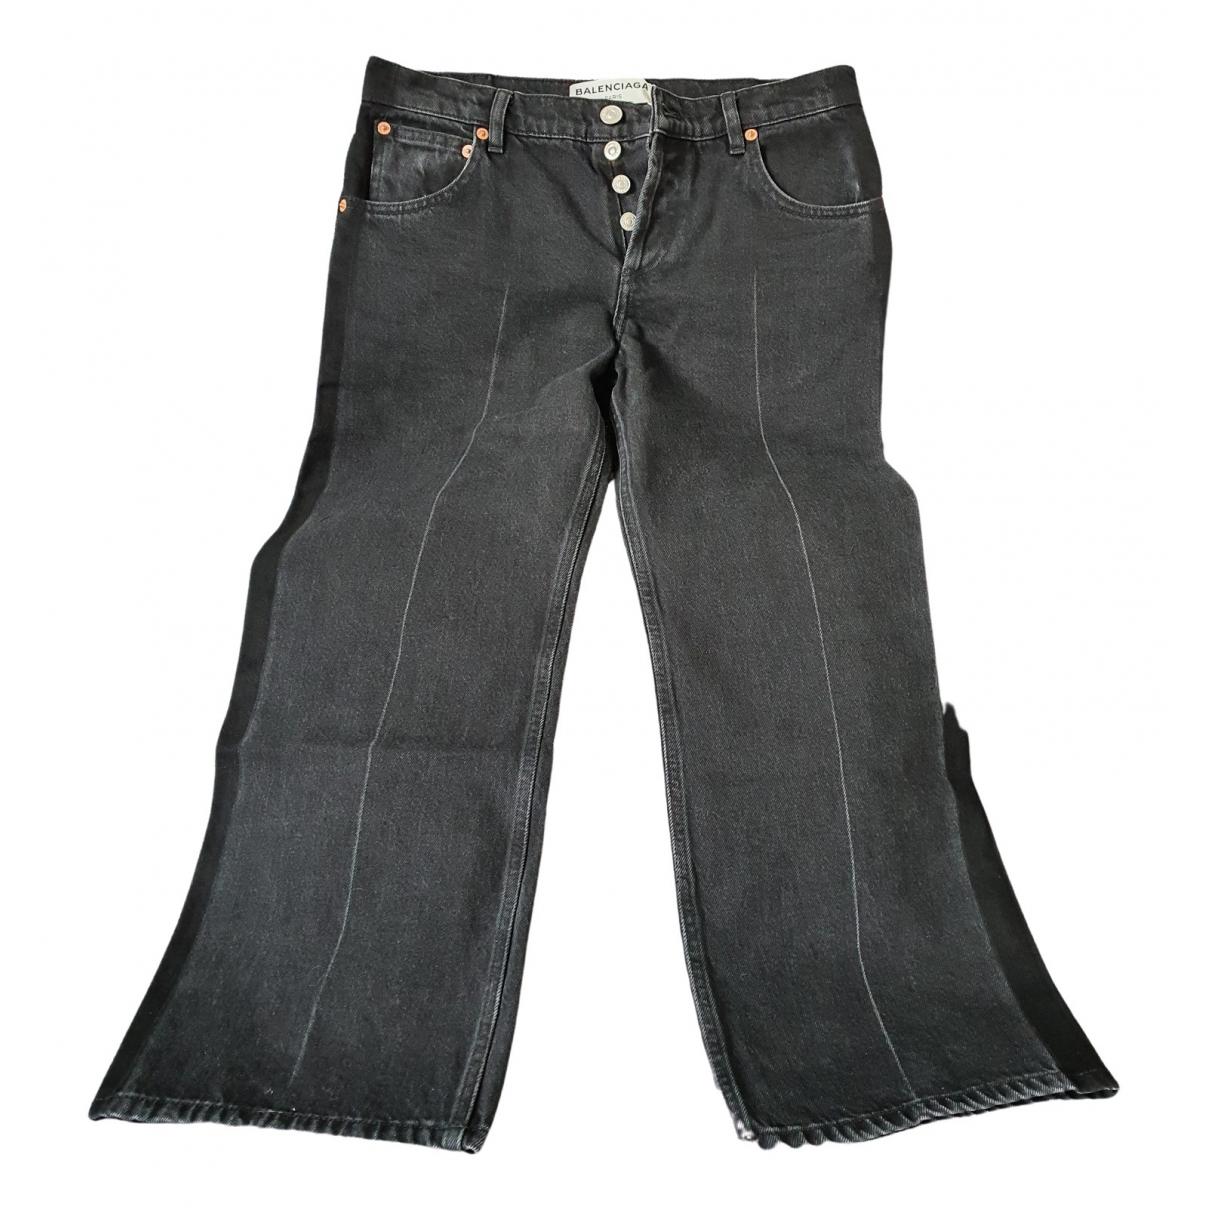 Balenciaga - Jean   pour femme en denim - noir